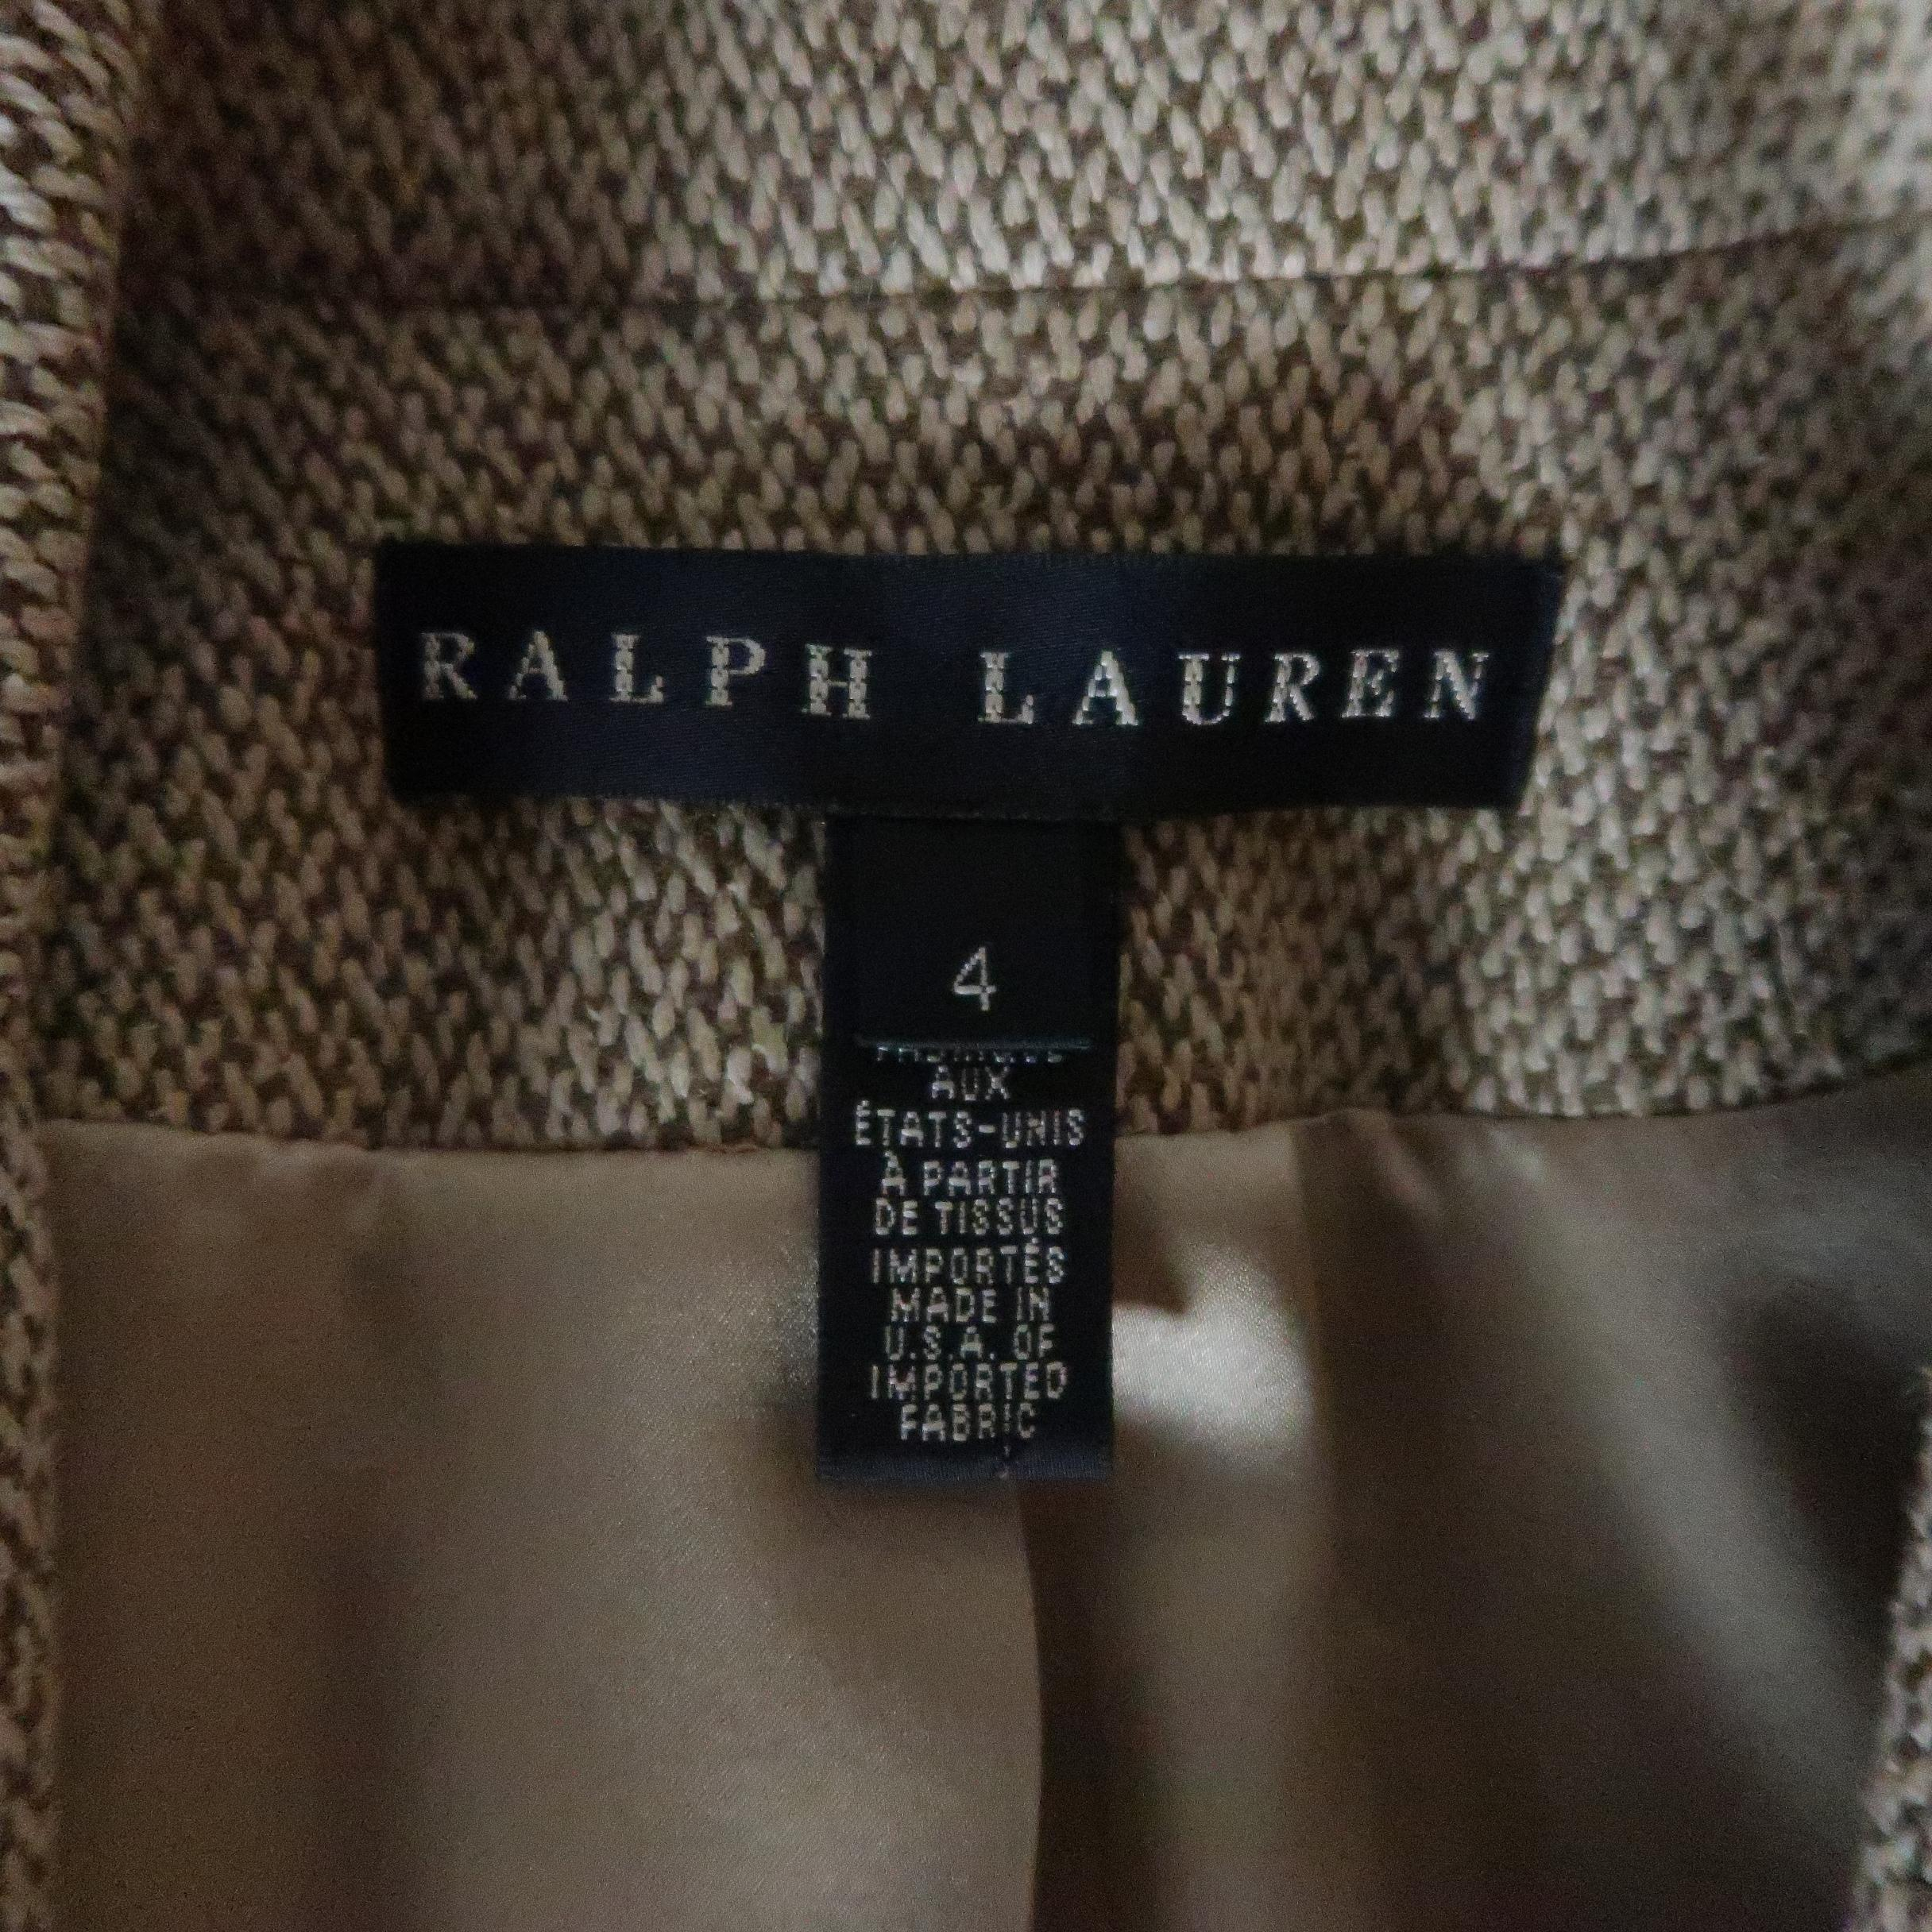 3c05743ea1 RALPH LAUREN Size 4 Beige Silk Wool Tweed Equestrian Jacket For Sale at  1stdibs